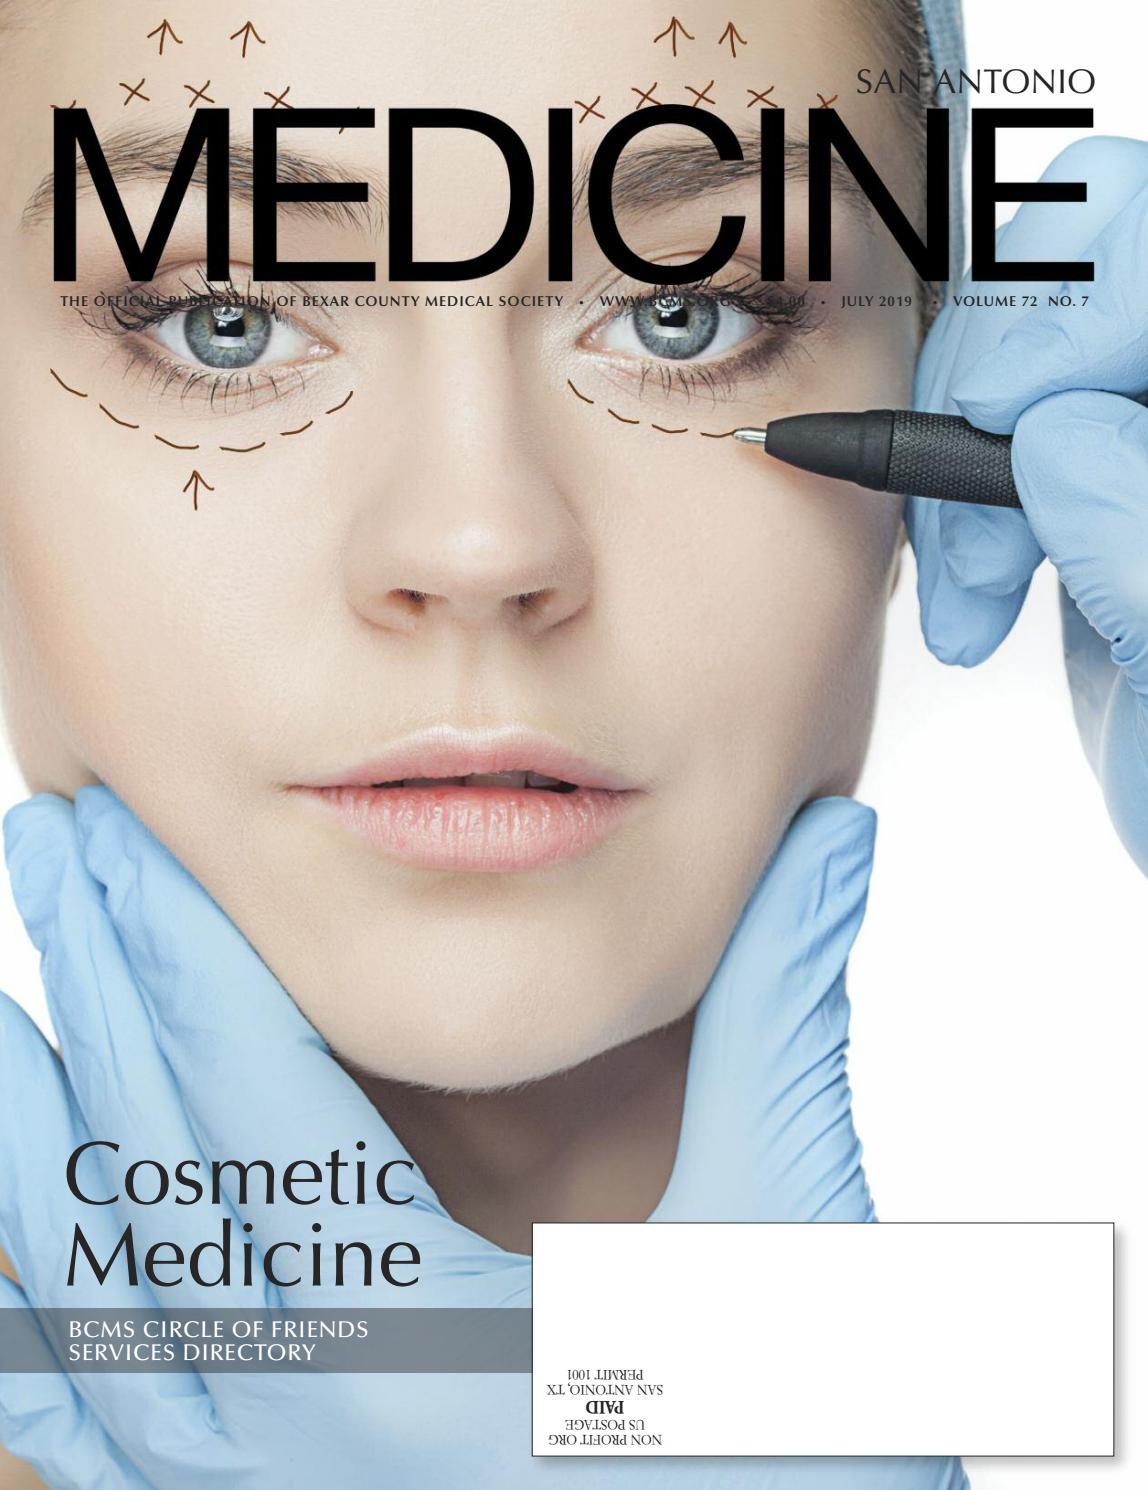 San Antonio Medicine July 2019 by Traveling Blender - issuu